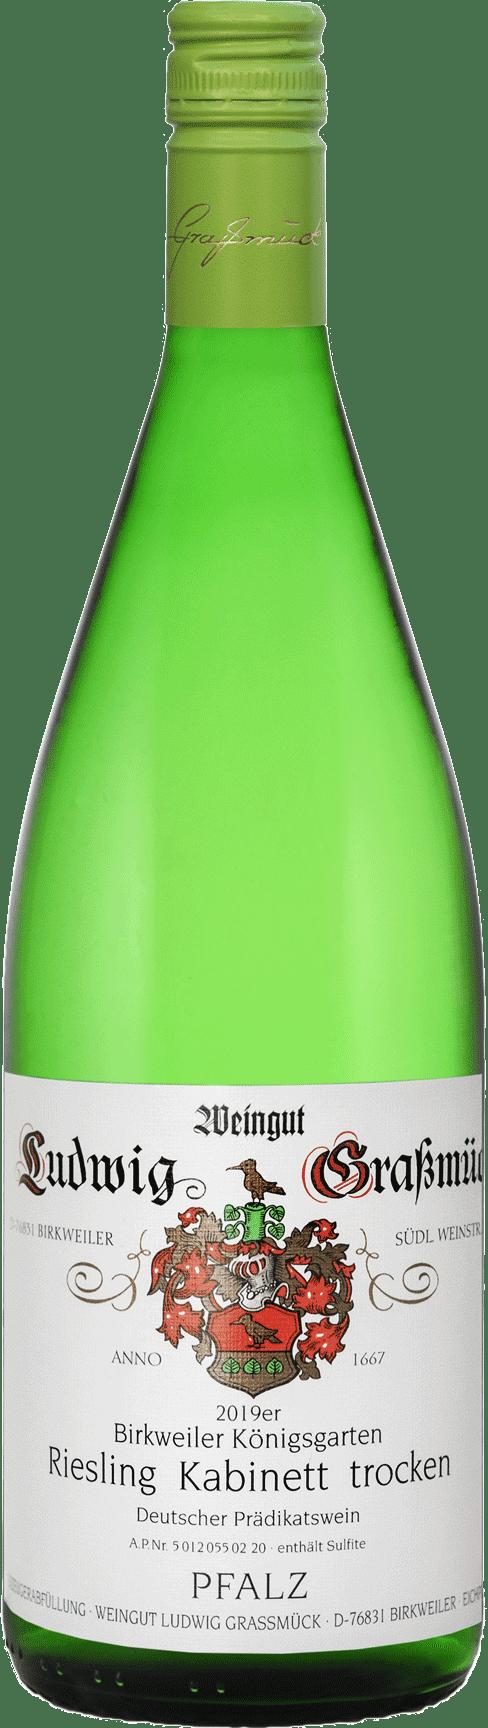 Weingut Ludwig Graßmück, Simon Graßmück, Riesling Kabinett, trocken 2019